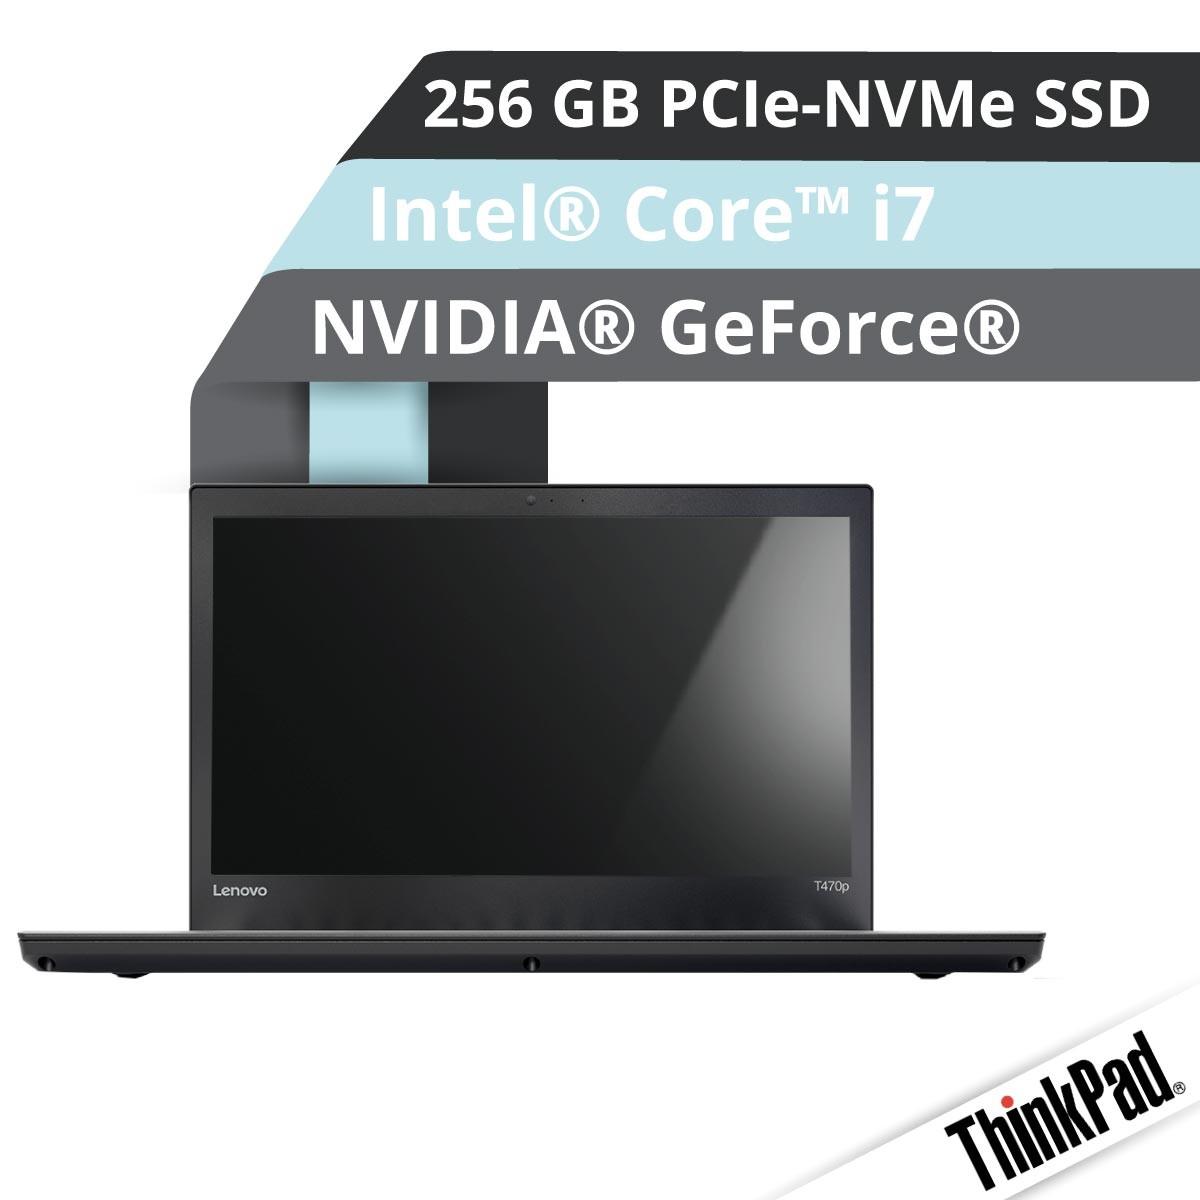 (EOL) Lenovo™ ThinkPad® T470p Notebook Modell 20J6-0018